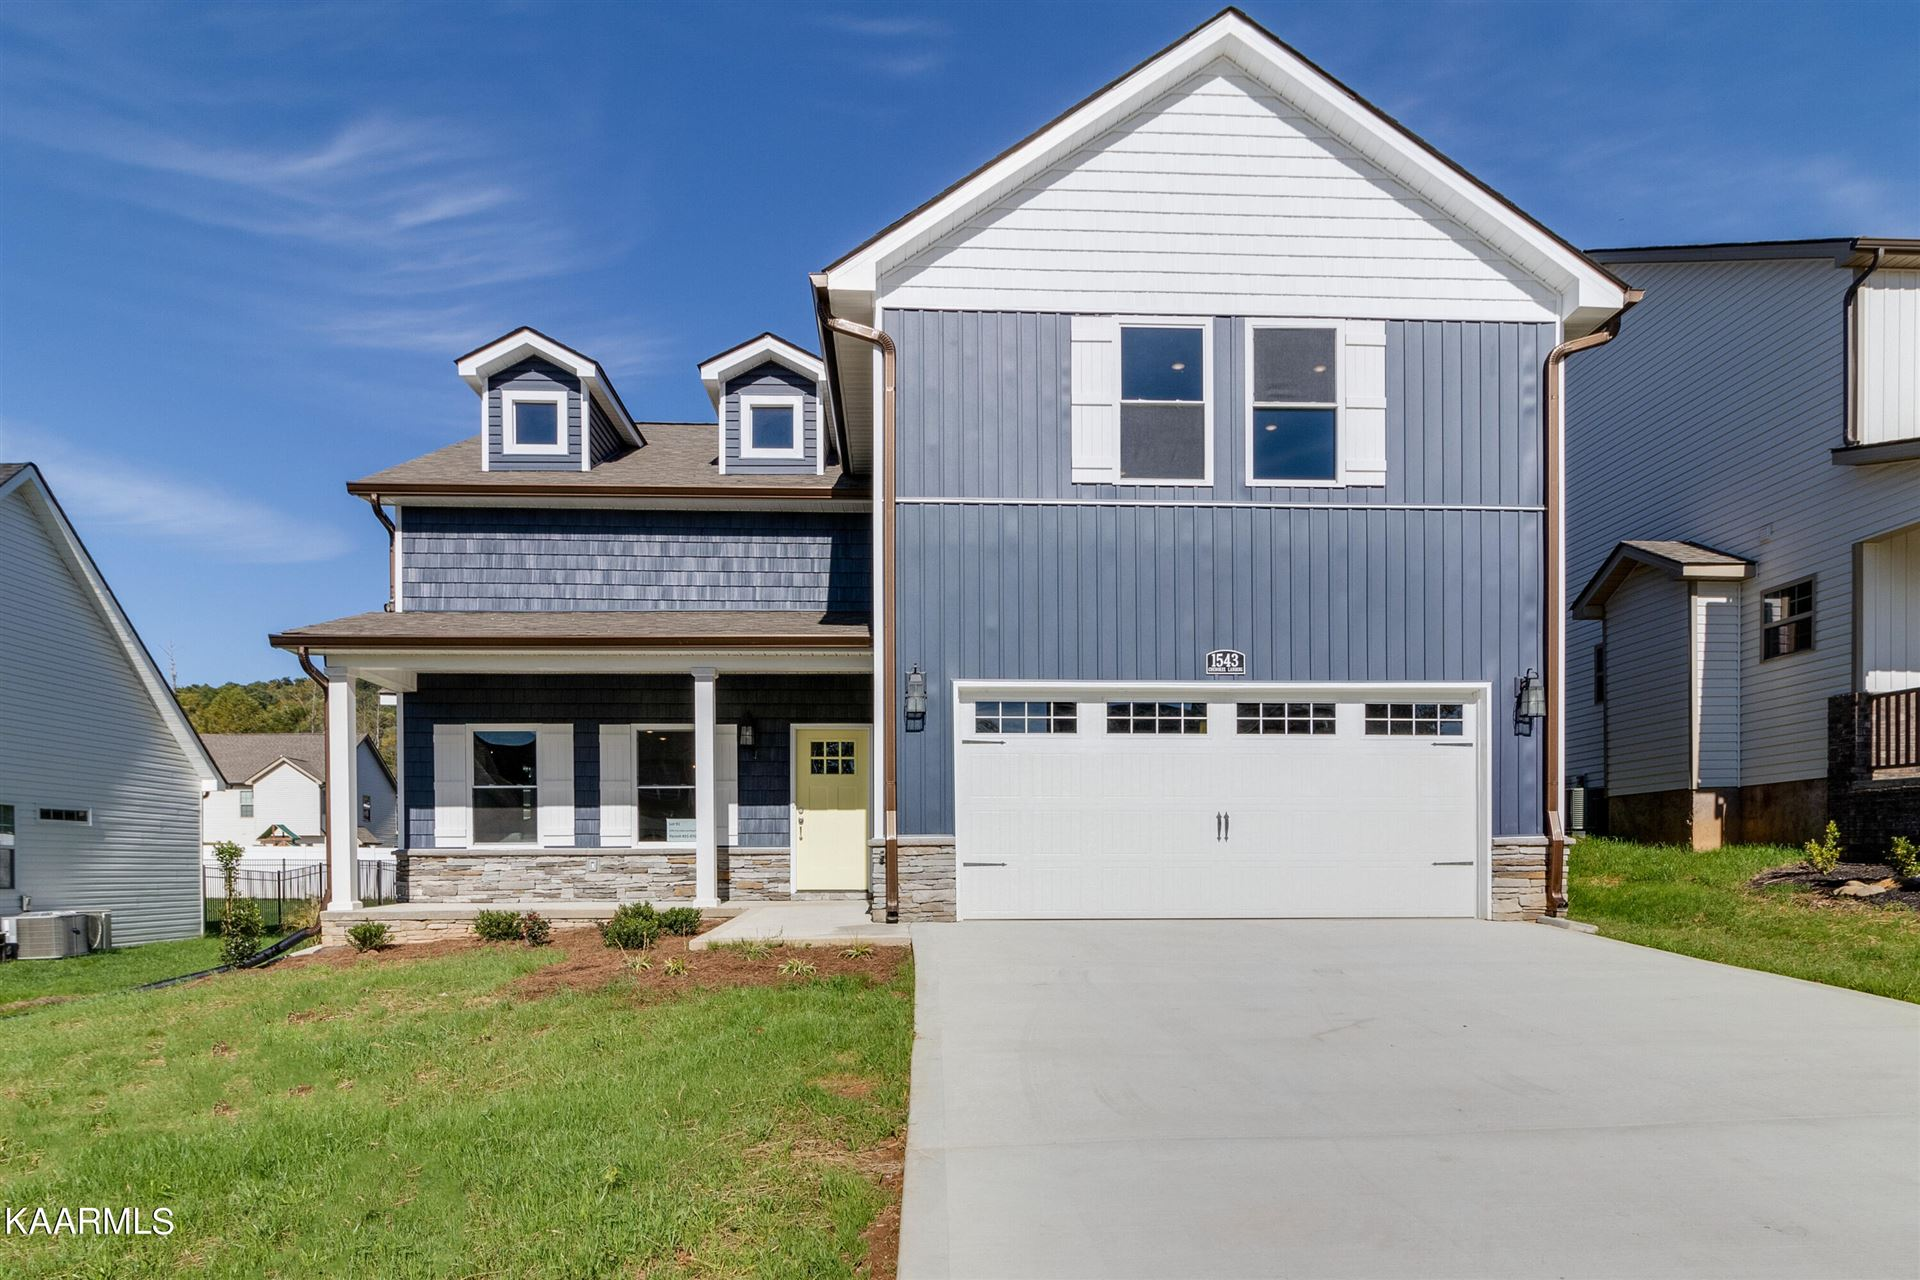 Photo of 1543 Cherokee Landing Drive, Knoxville, TN 37920 (MLS # 1170891)